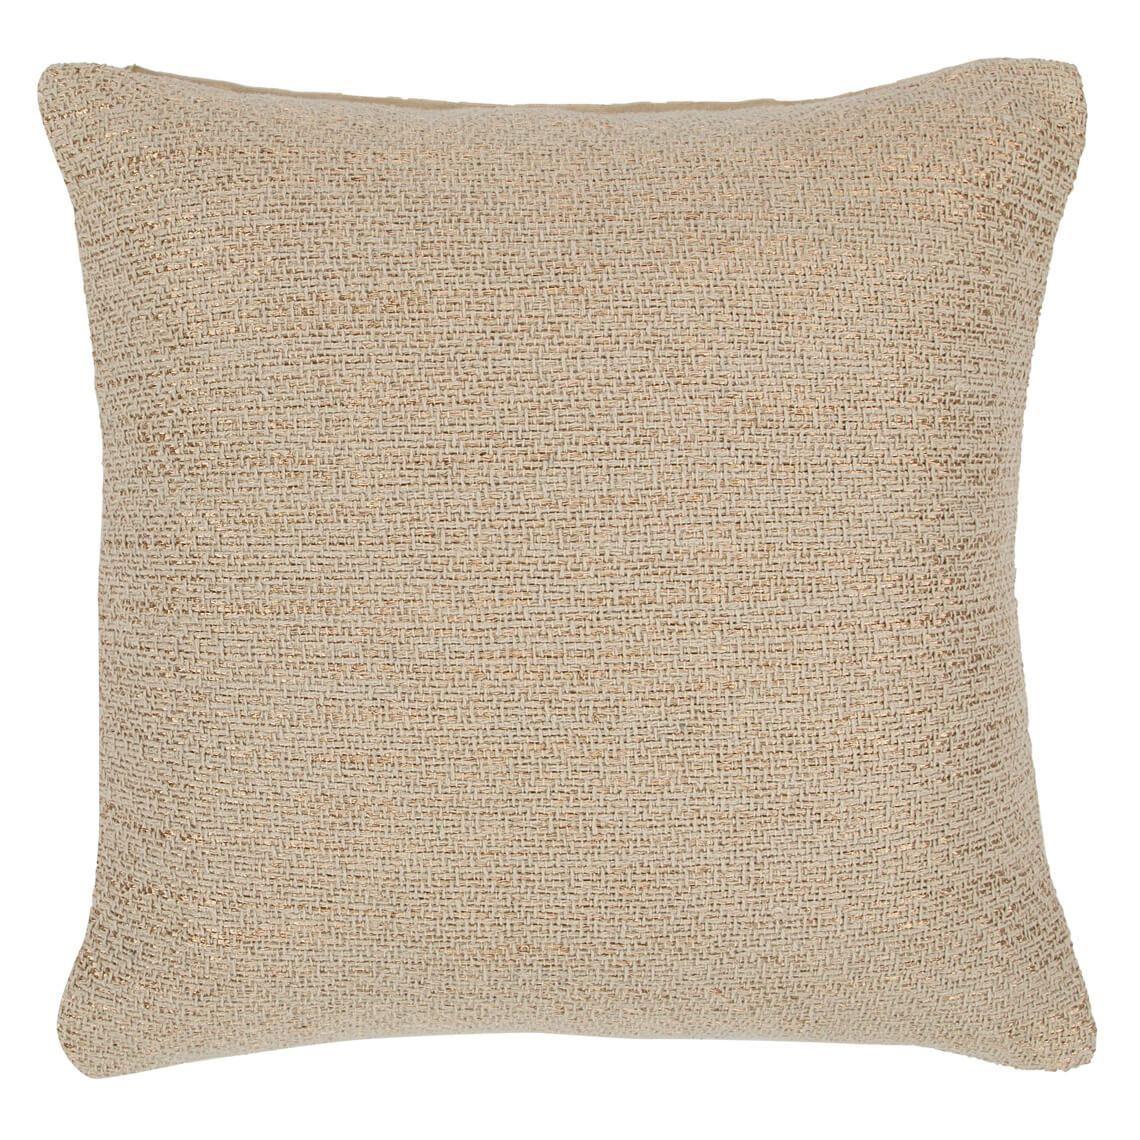 Artrifus Cushion Size W 50cm x D 50cm x H 10cm in Natural 50% Metallic 50% Cotton Freedom